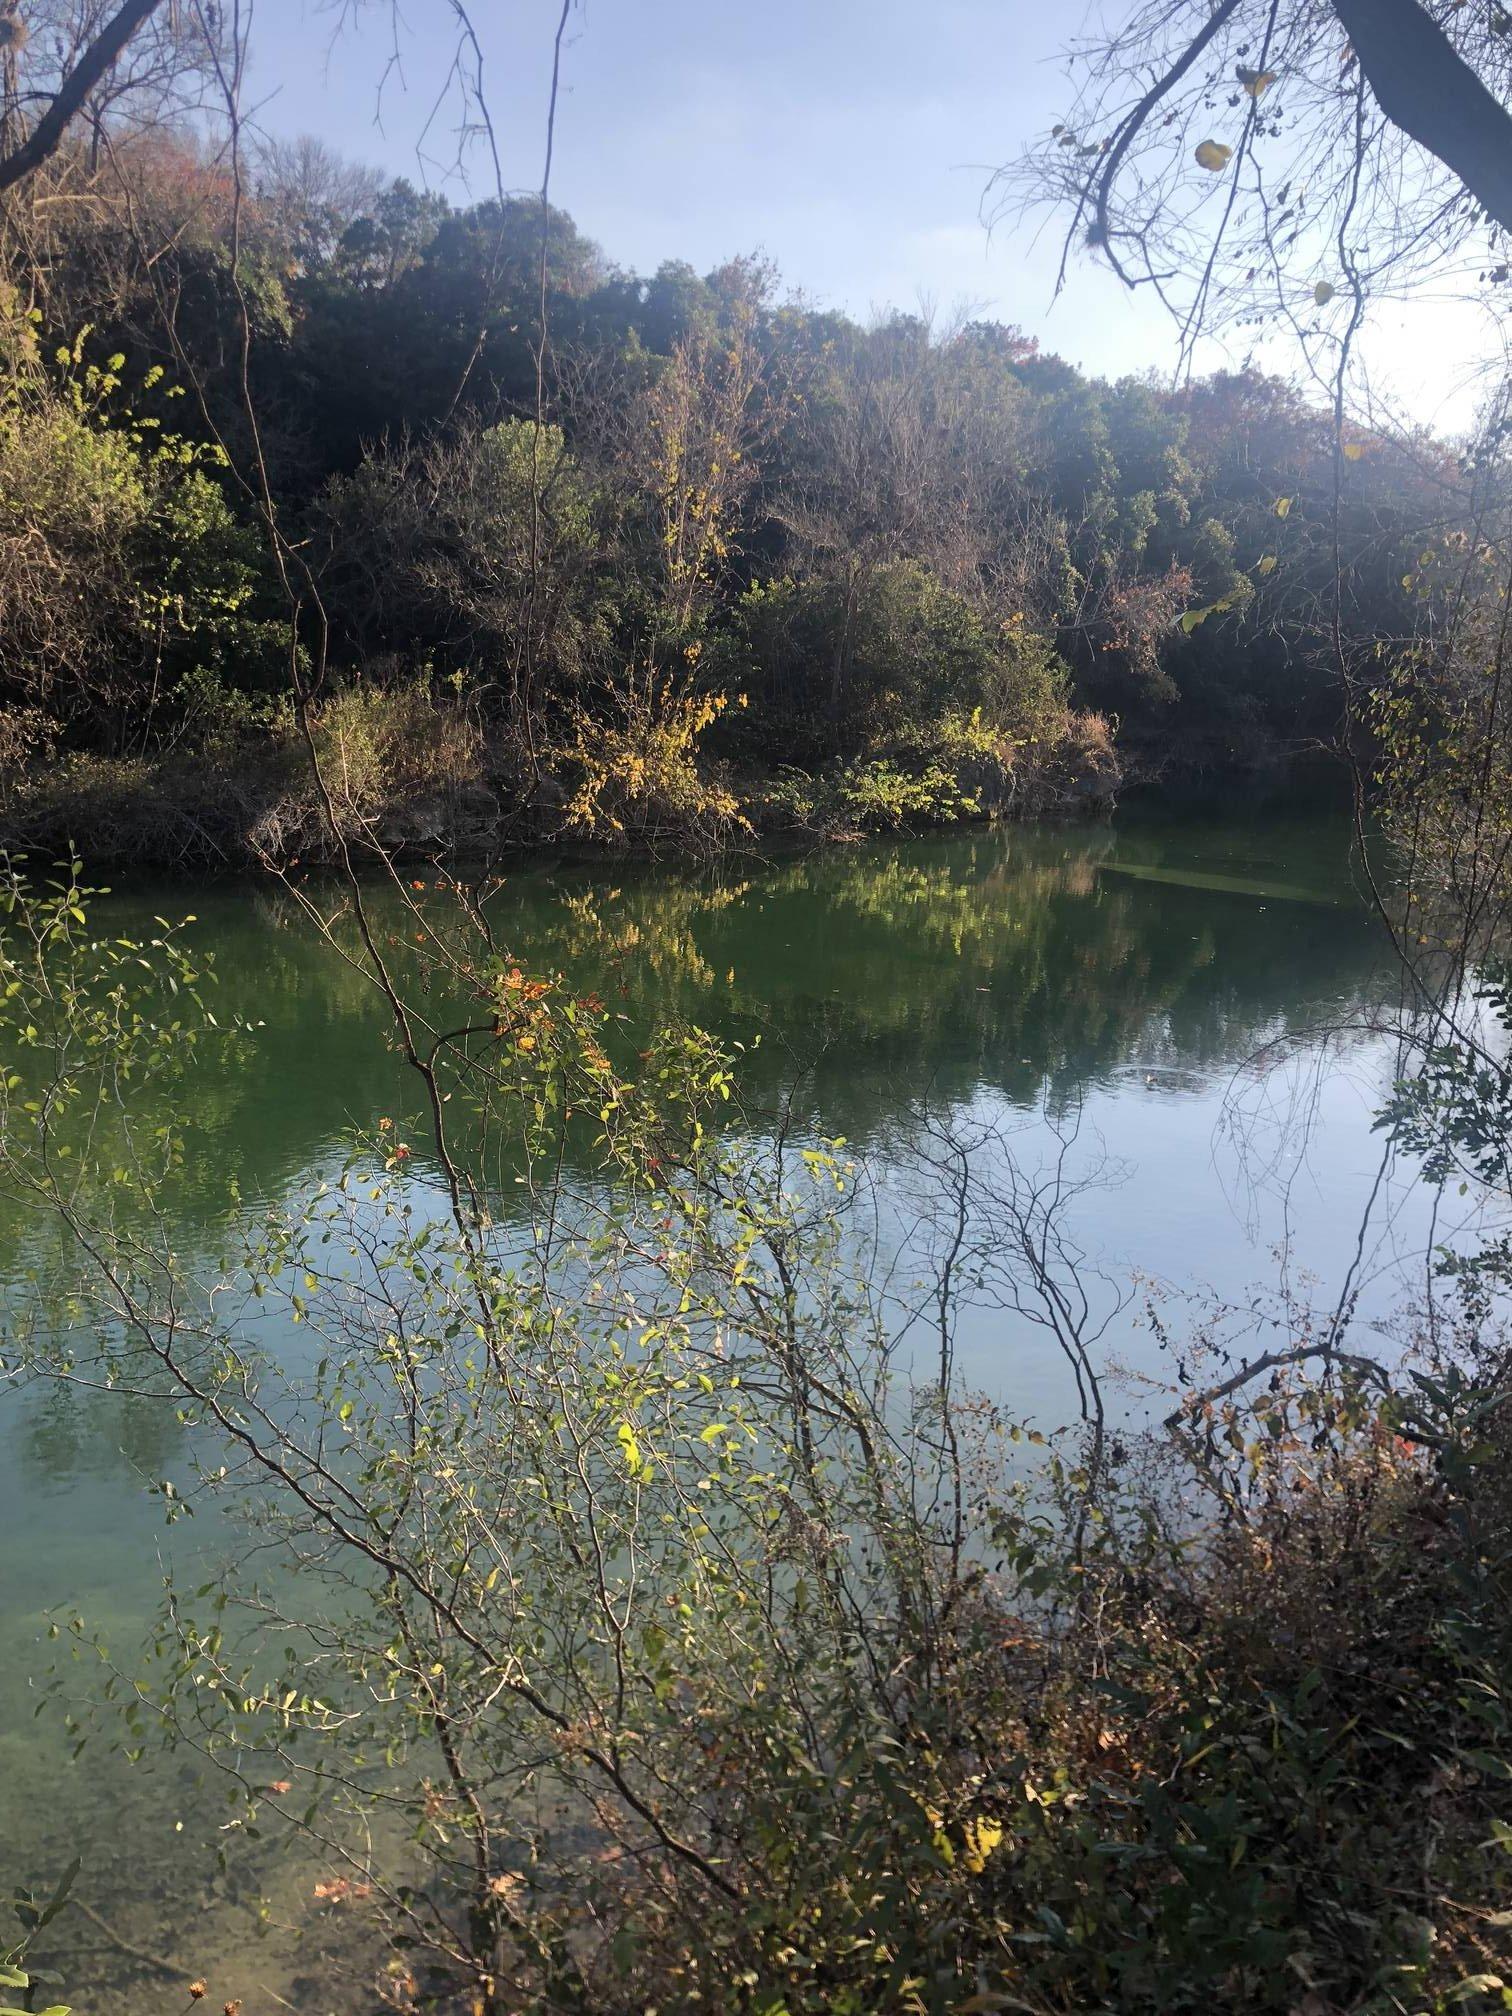 Image of Barton Creek from Barton Creek Trail.